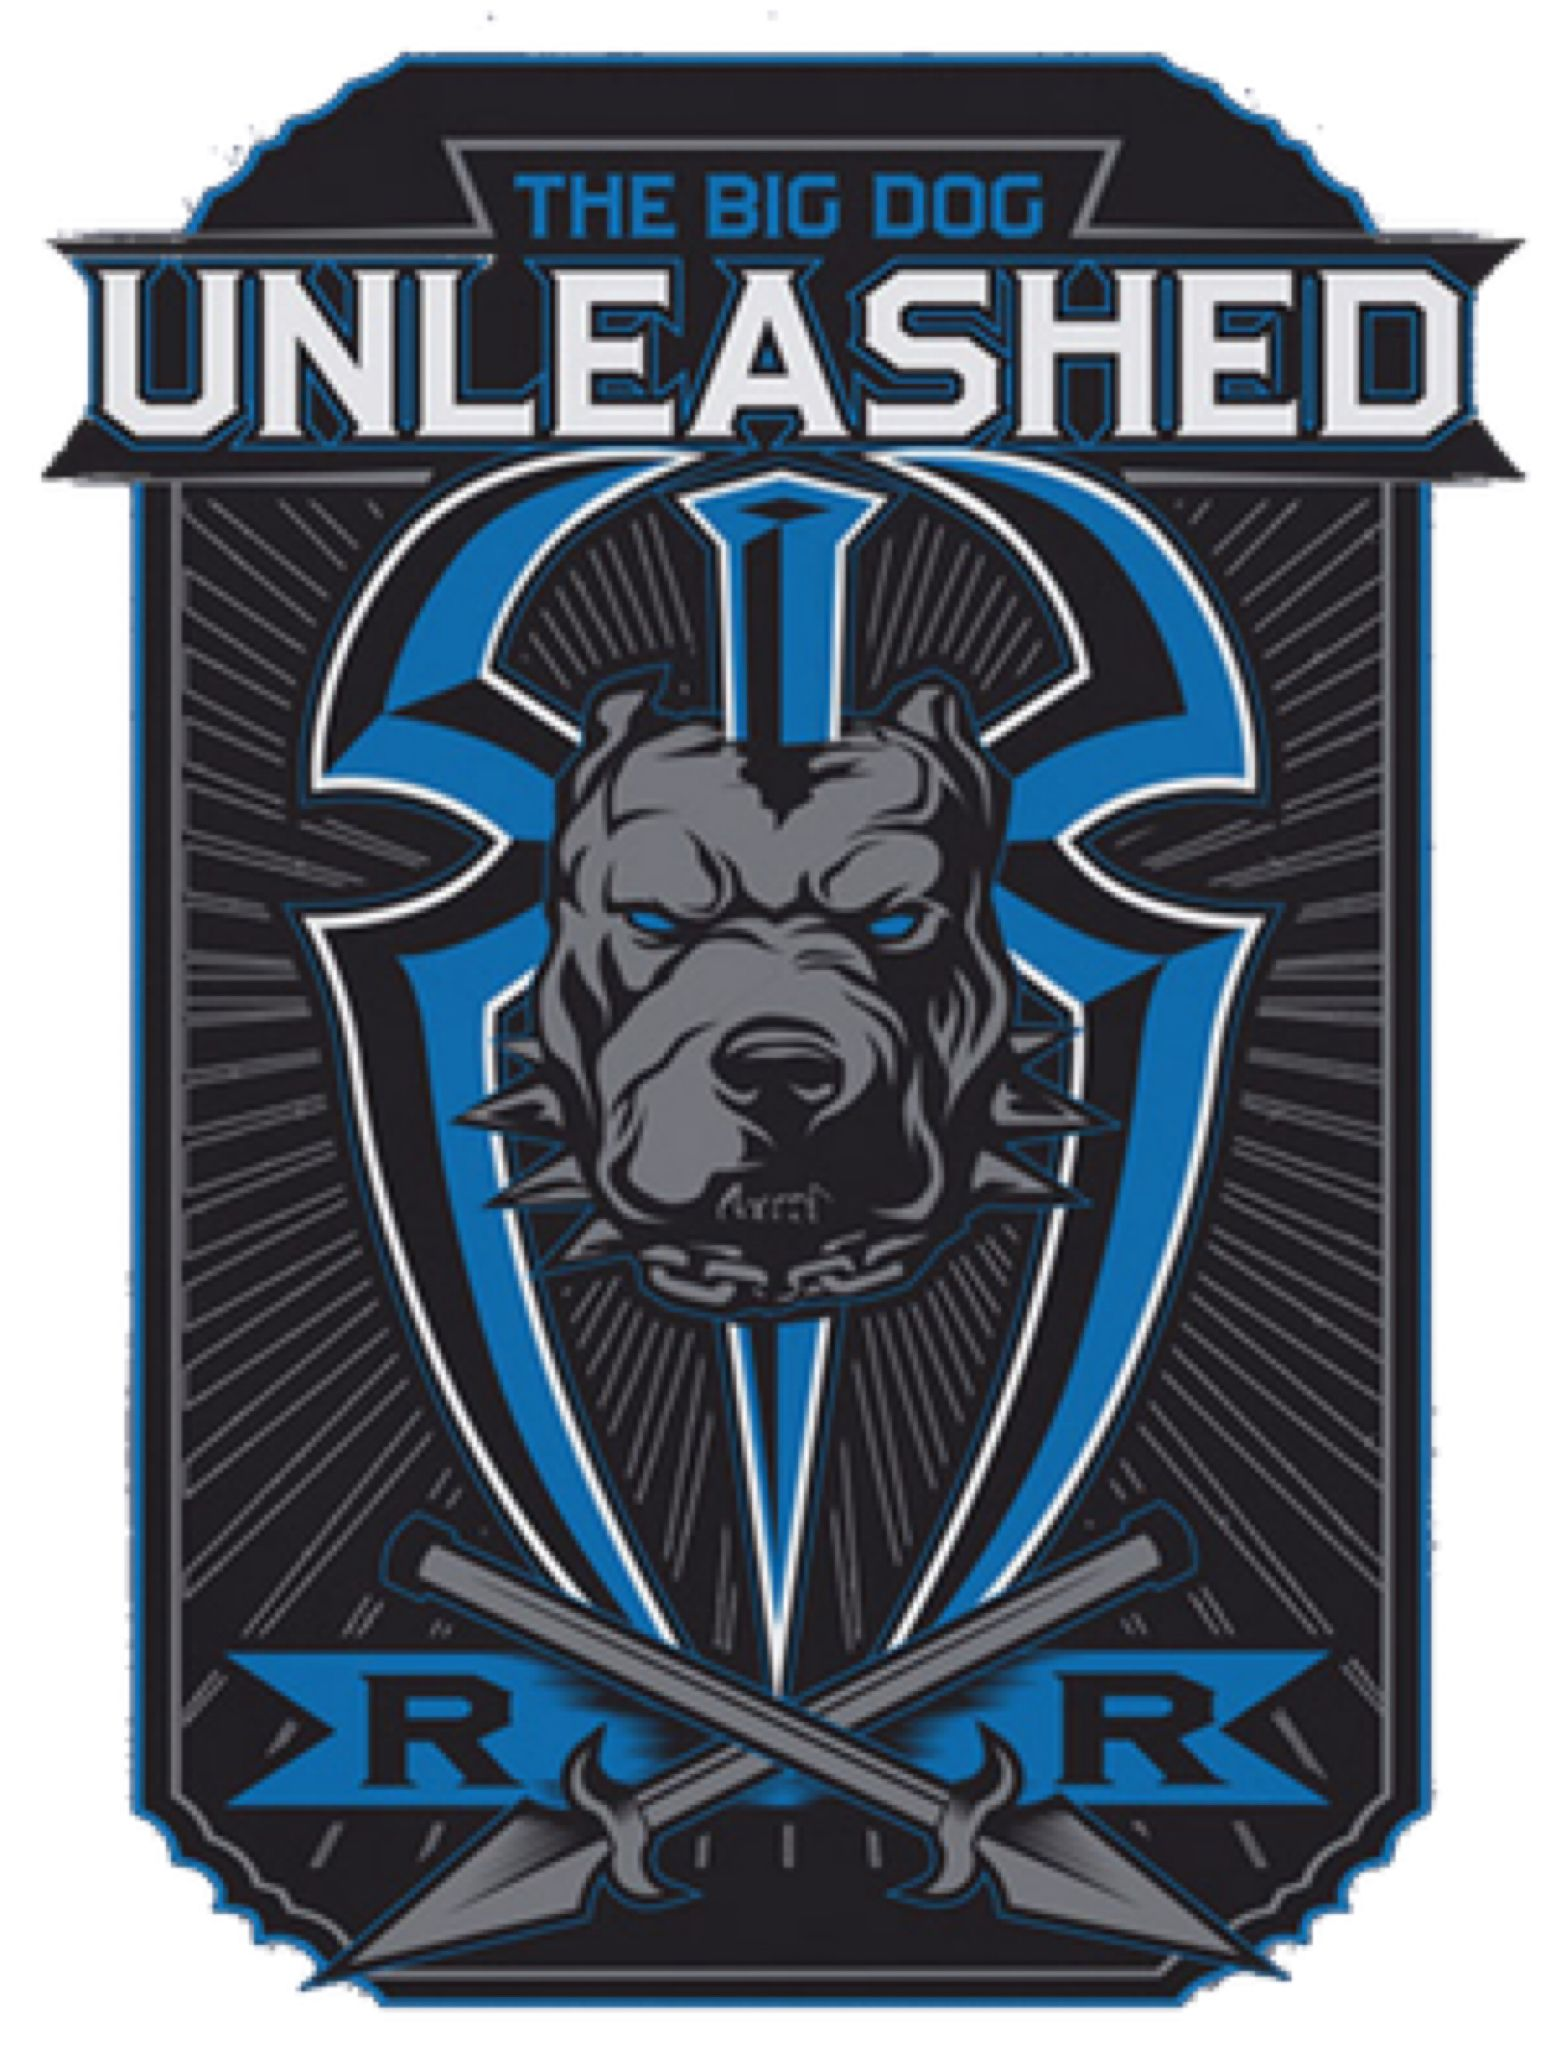 Roman Reigns Big Dog Unleashed 2019 Logo Png By Ambriegnsasylum16 On Deviantart Roman Reigns Logo Roman Reigns Superman Punch Roman Reigns